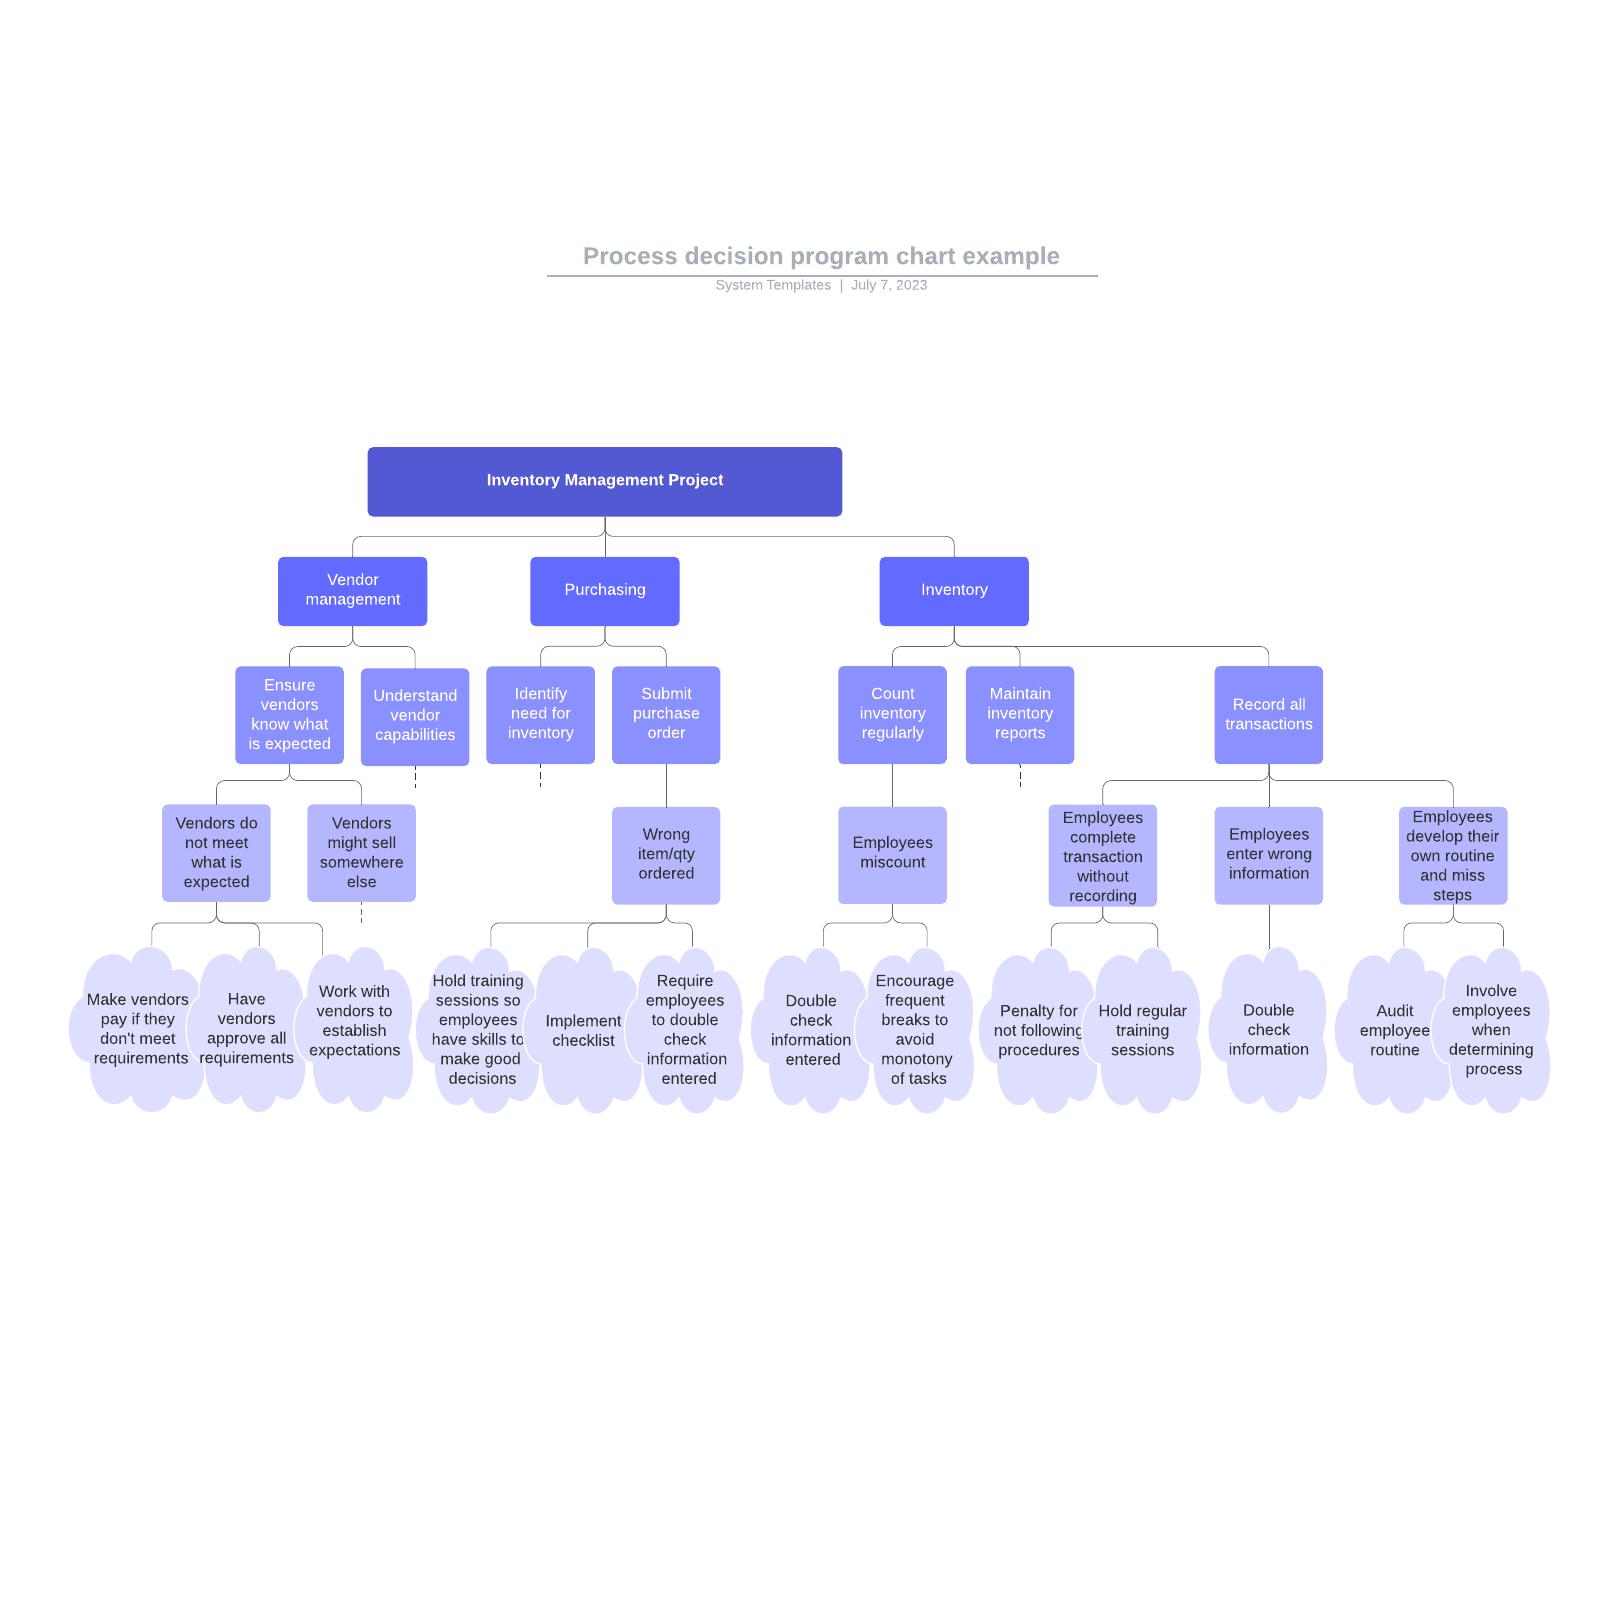 Process decision program chart example